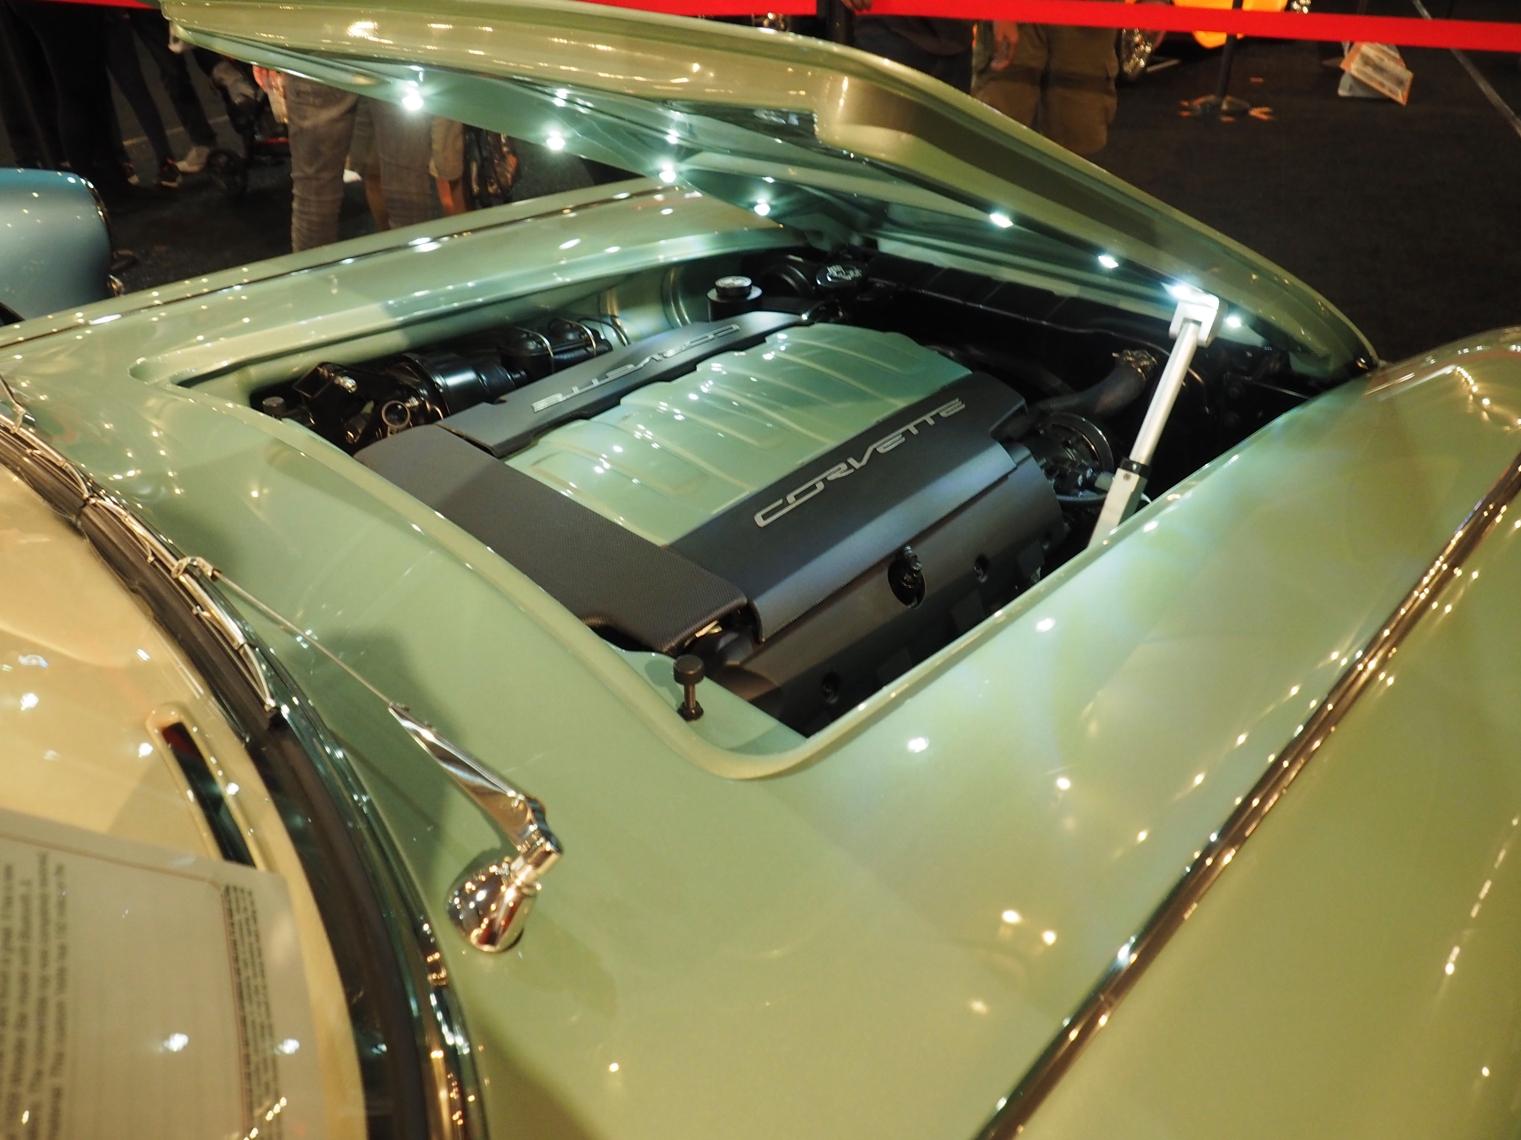 2021 Clevenger 1959 Corvette Convertible restomod engine